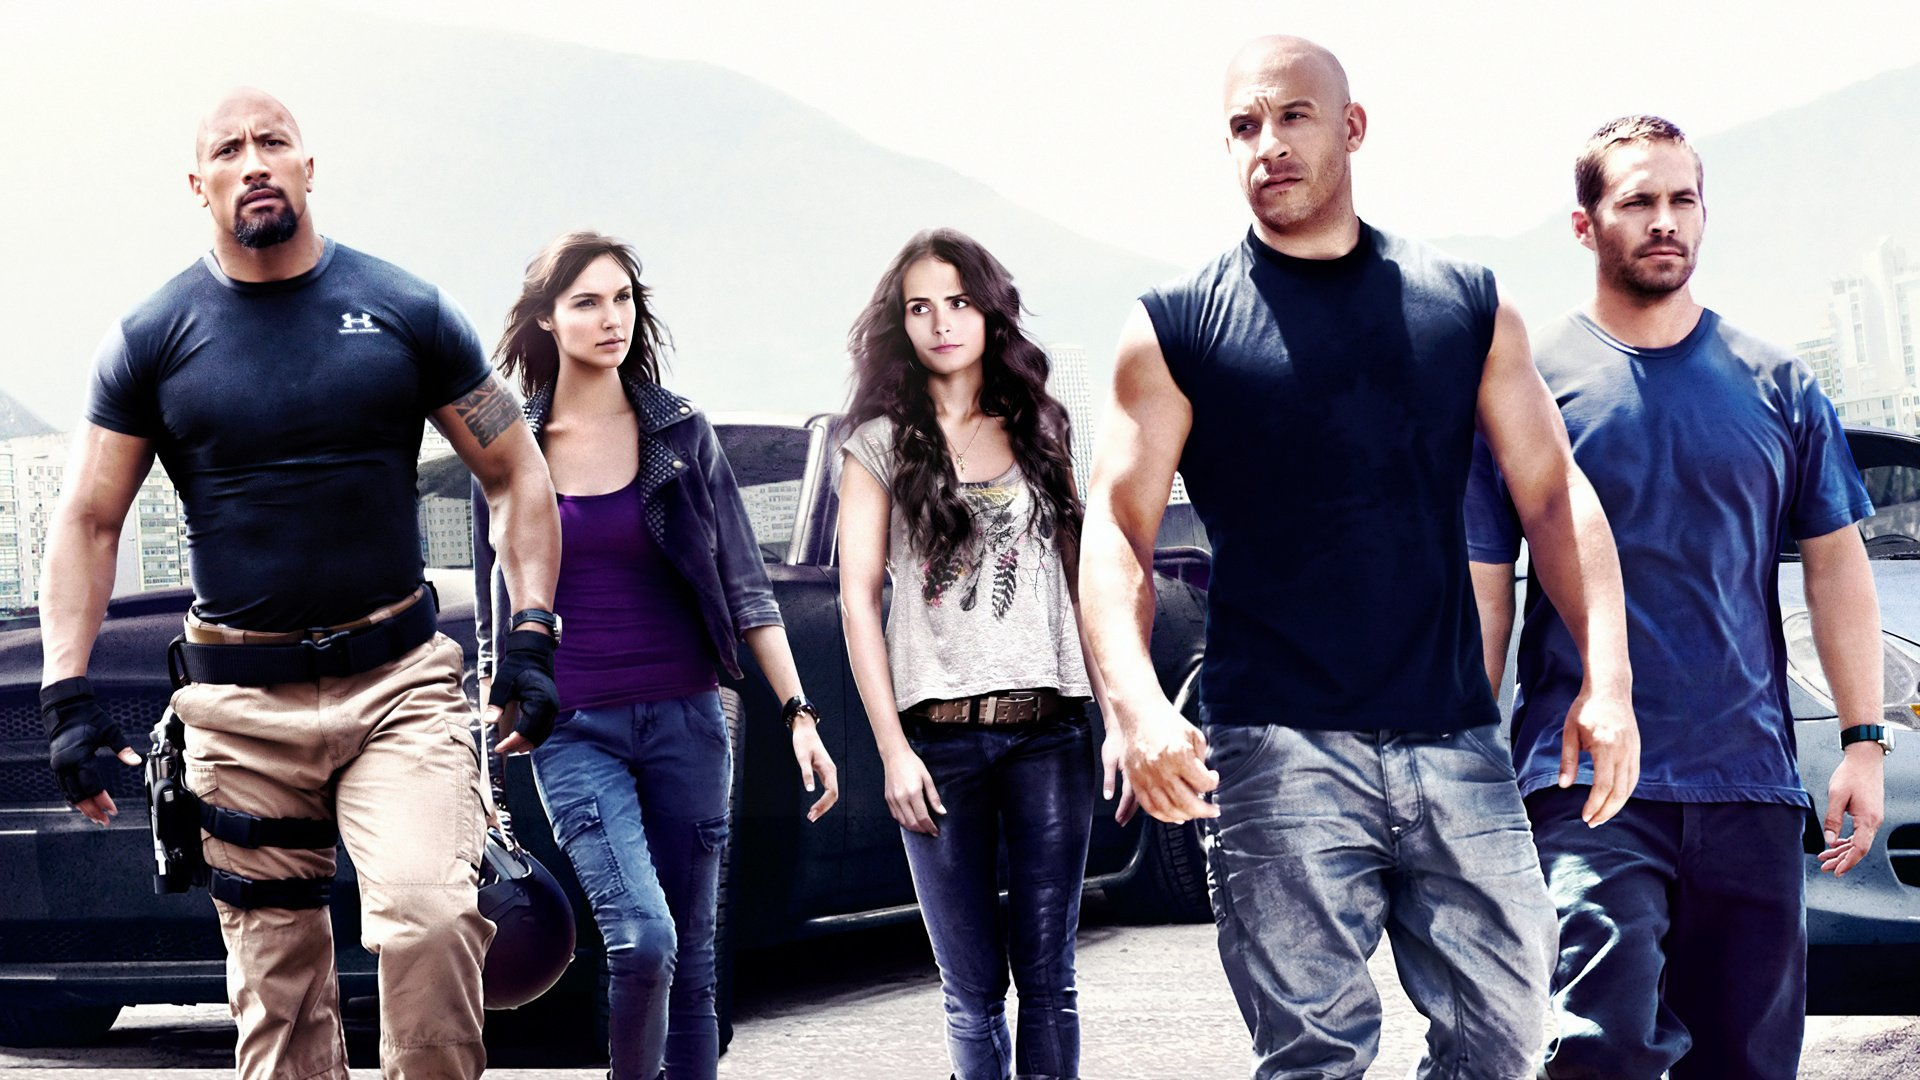 Un'immagine dalla saga Fast & Furious